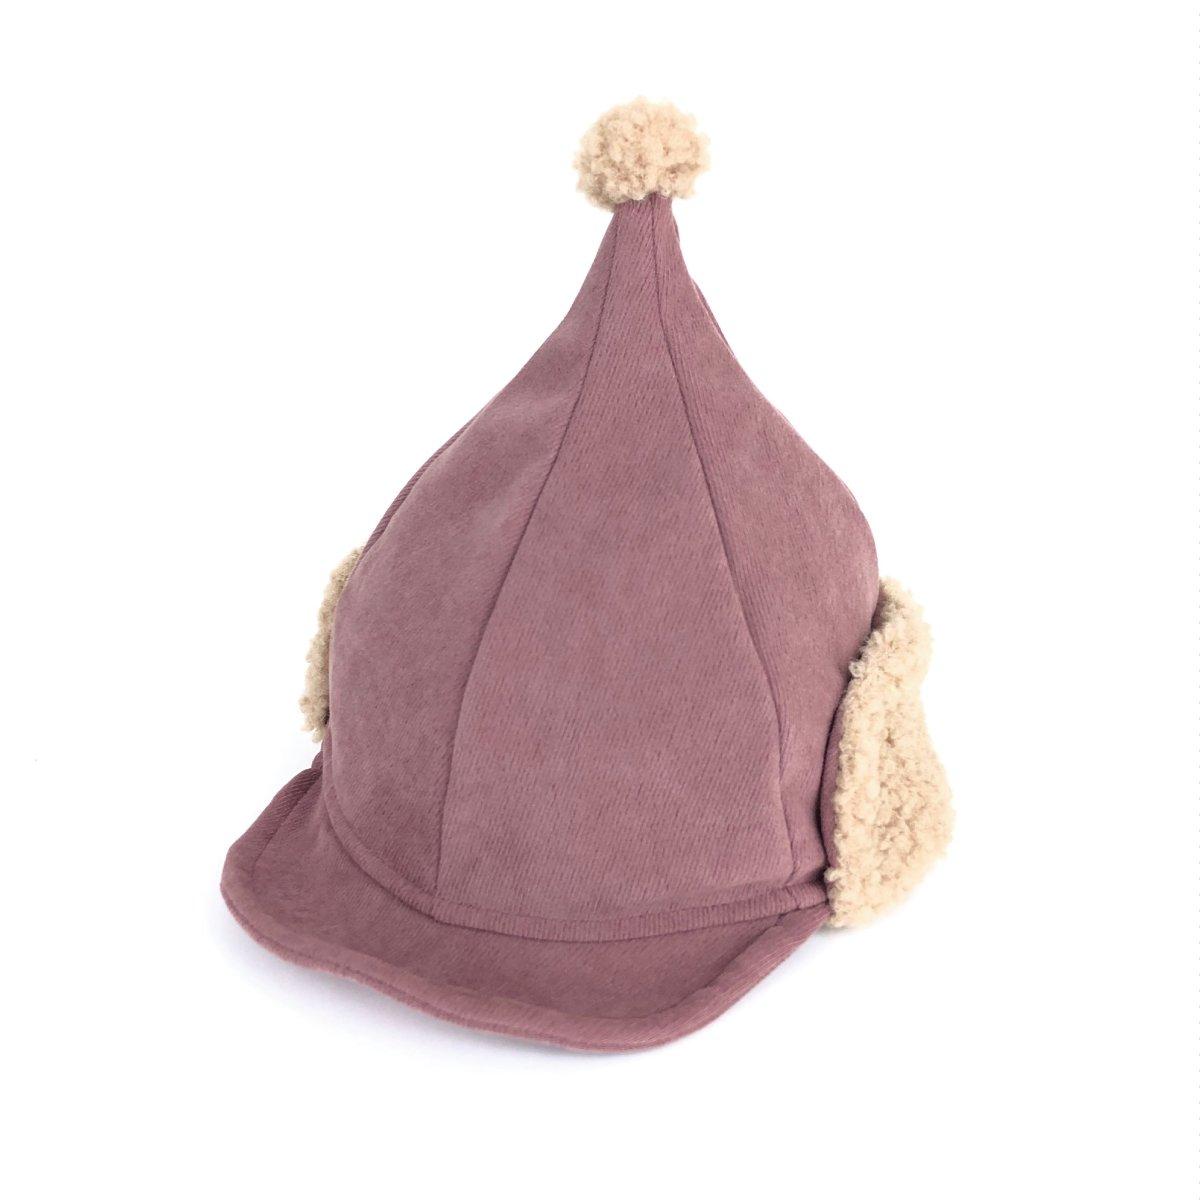 【KIDS】Tongari Ear Pon Cap 詳細画像1